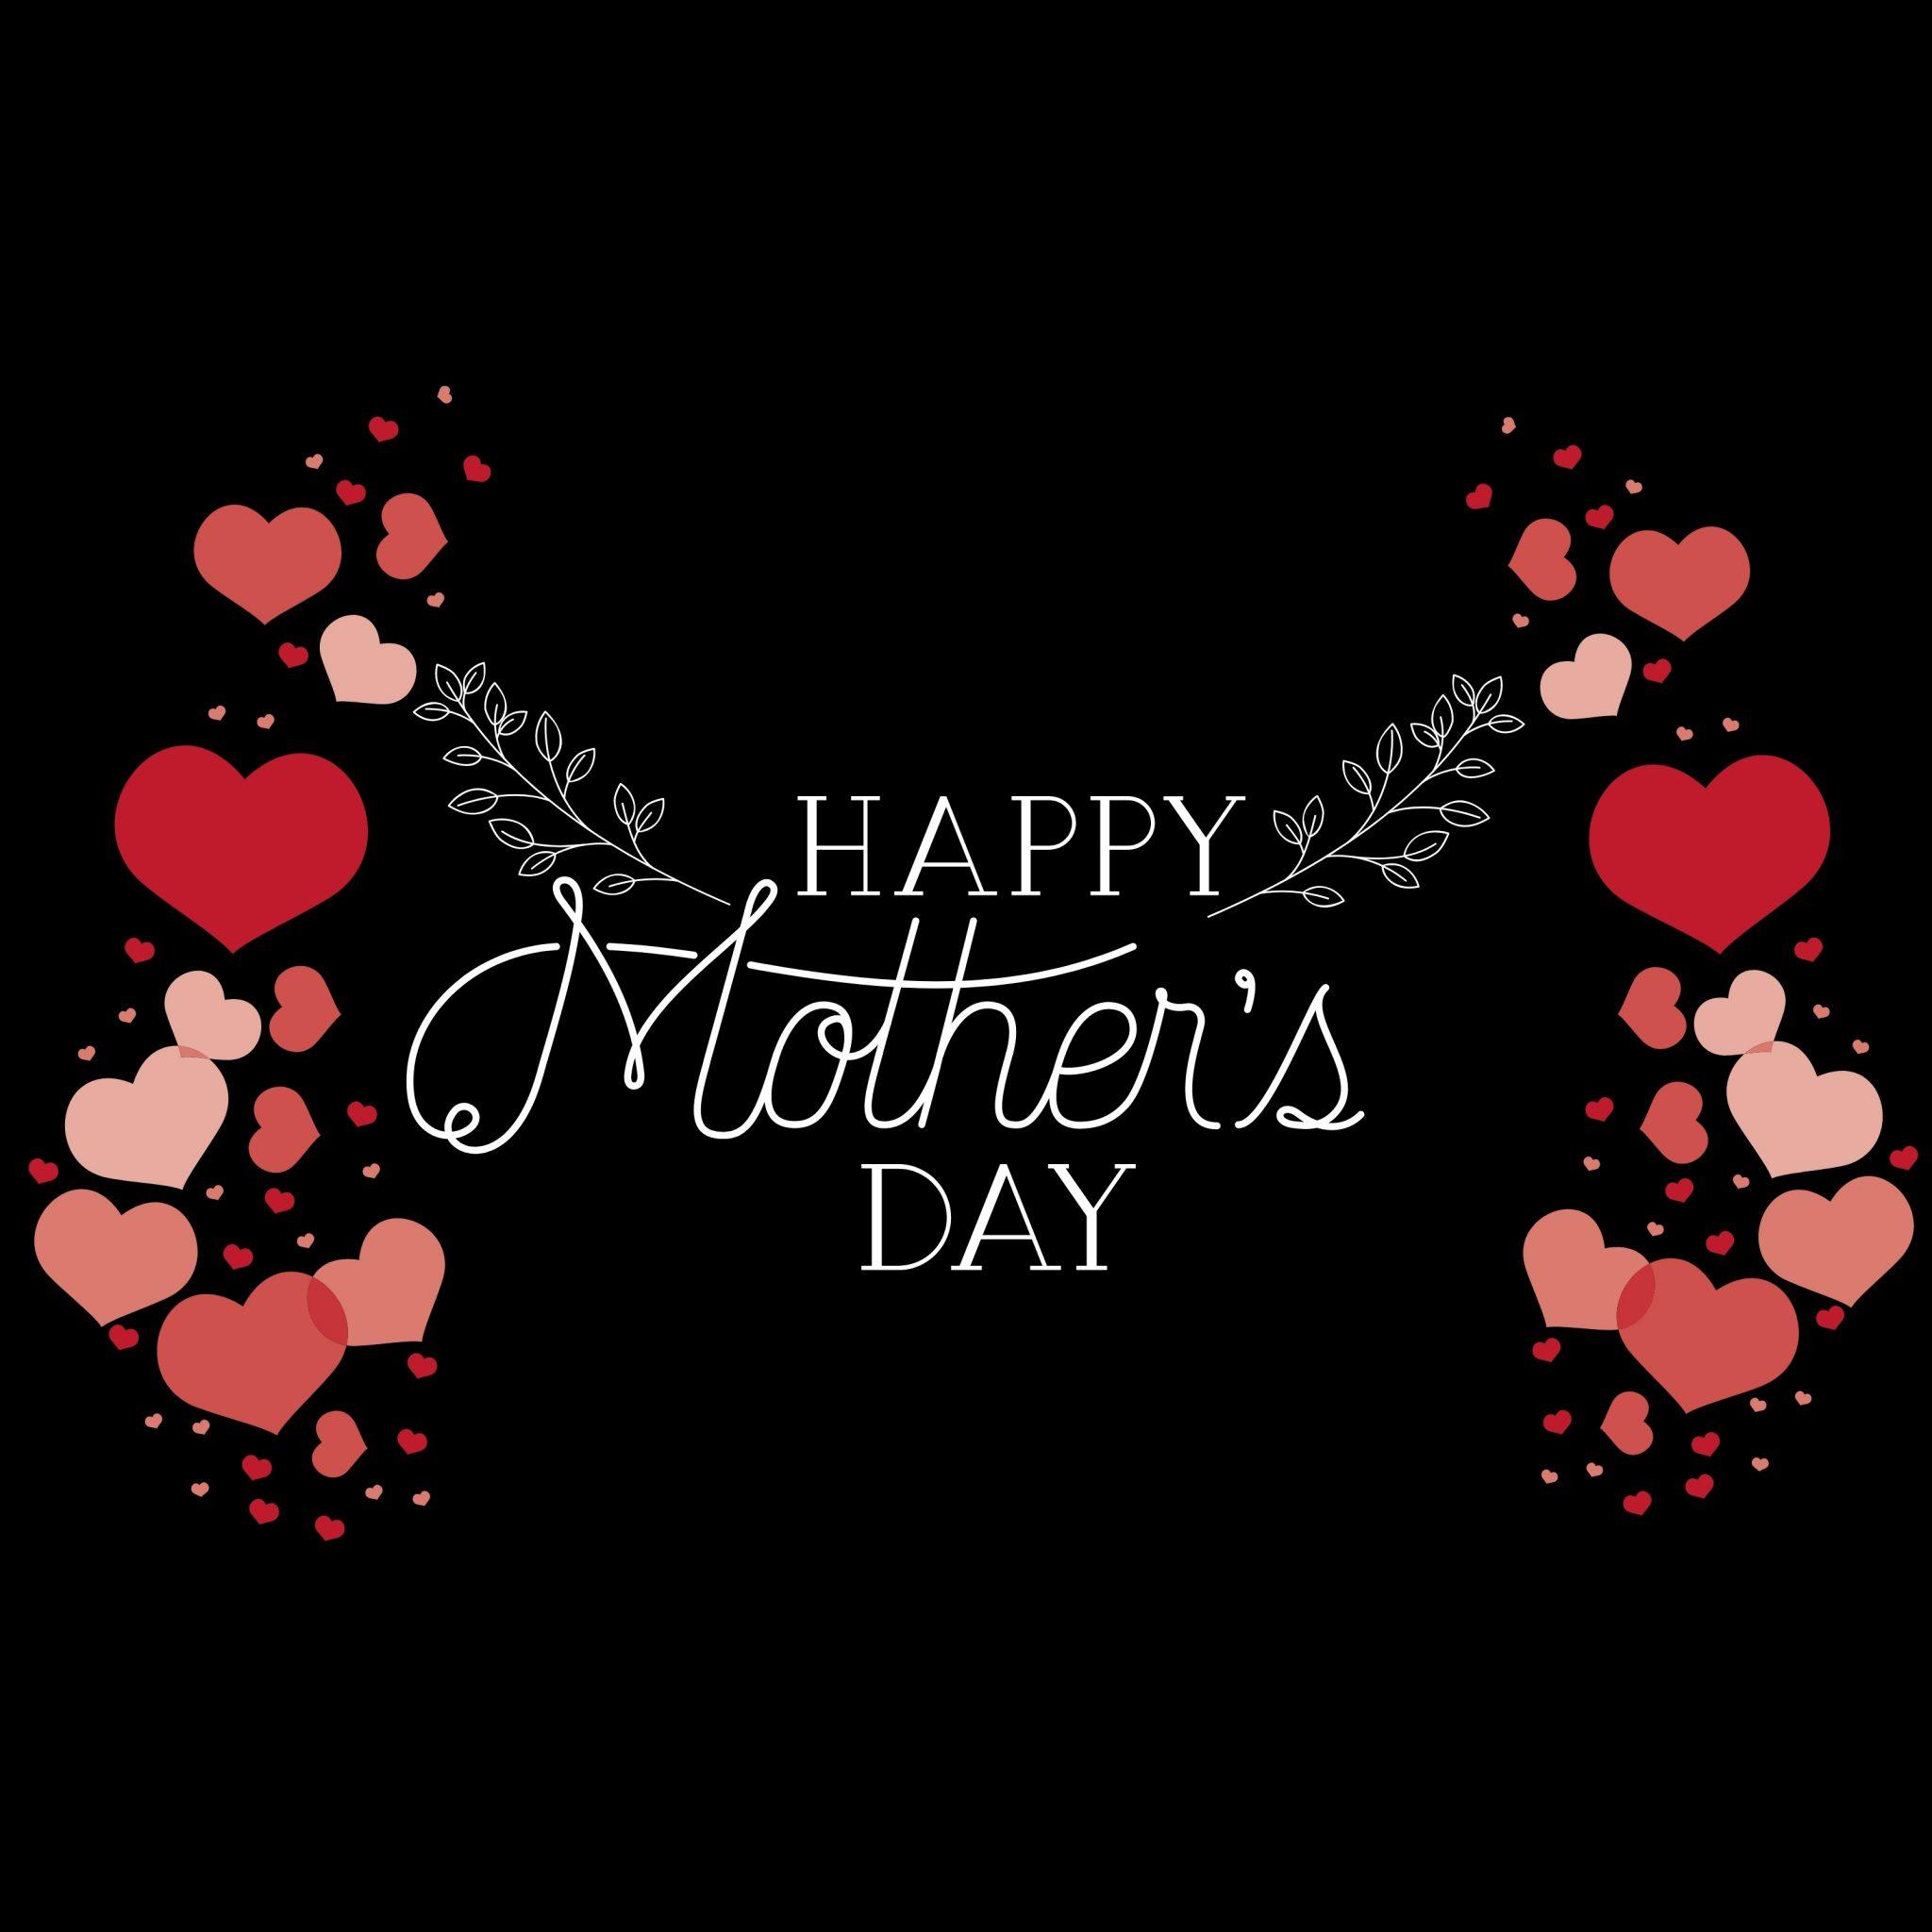 2048x2048 wallpapers iPad retina Happy Mothers Day iPad Wallpaper 2048x2048 pixels resolution